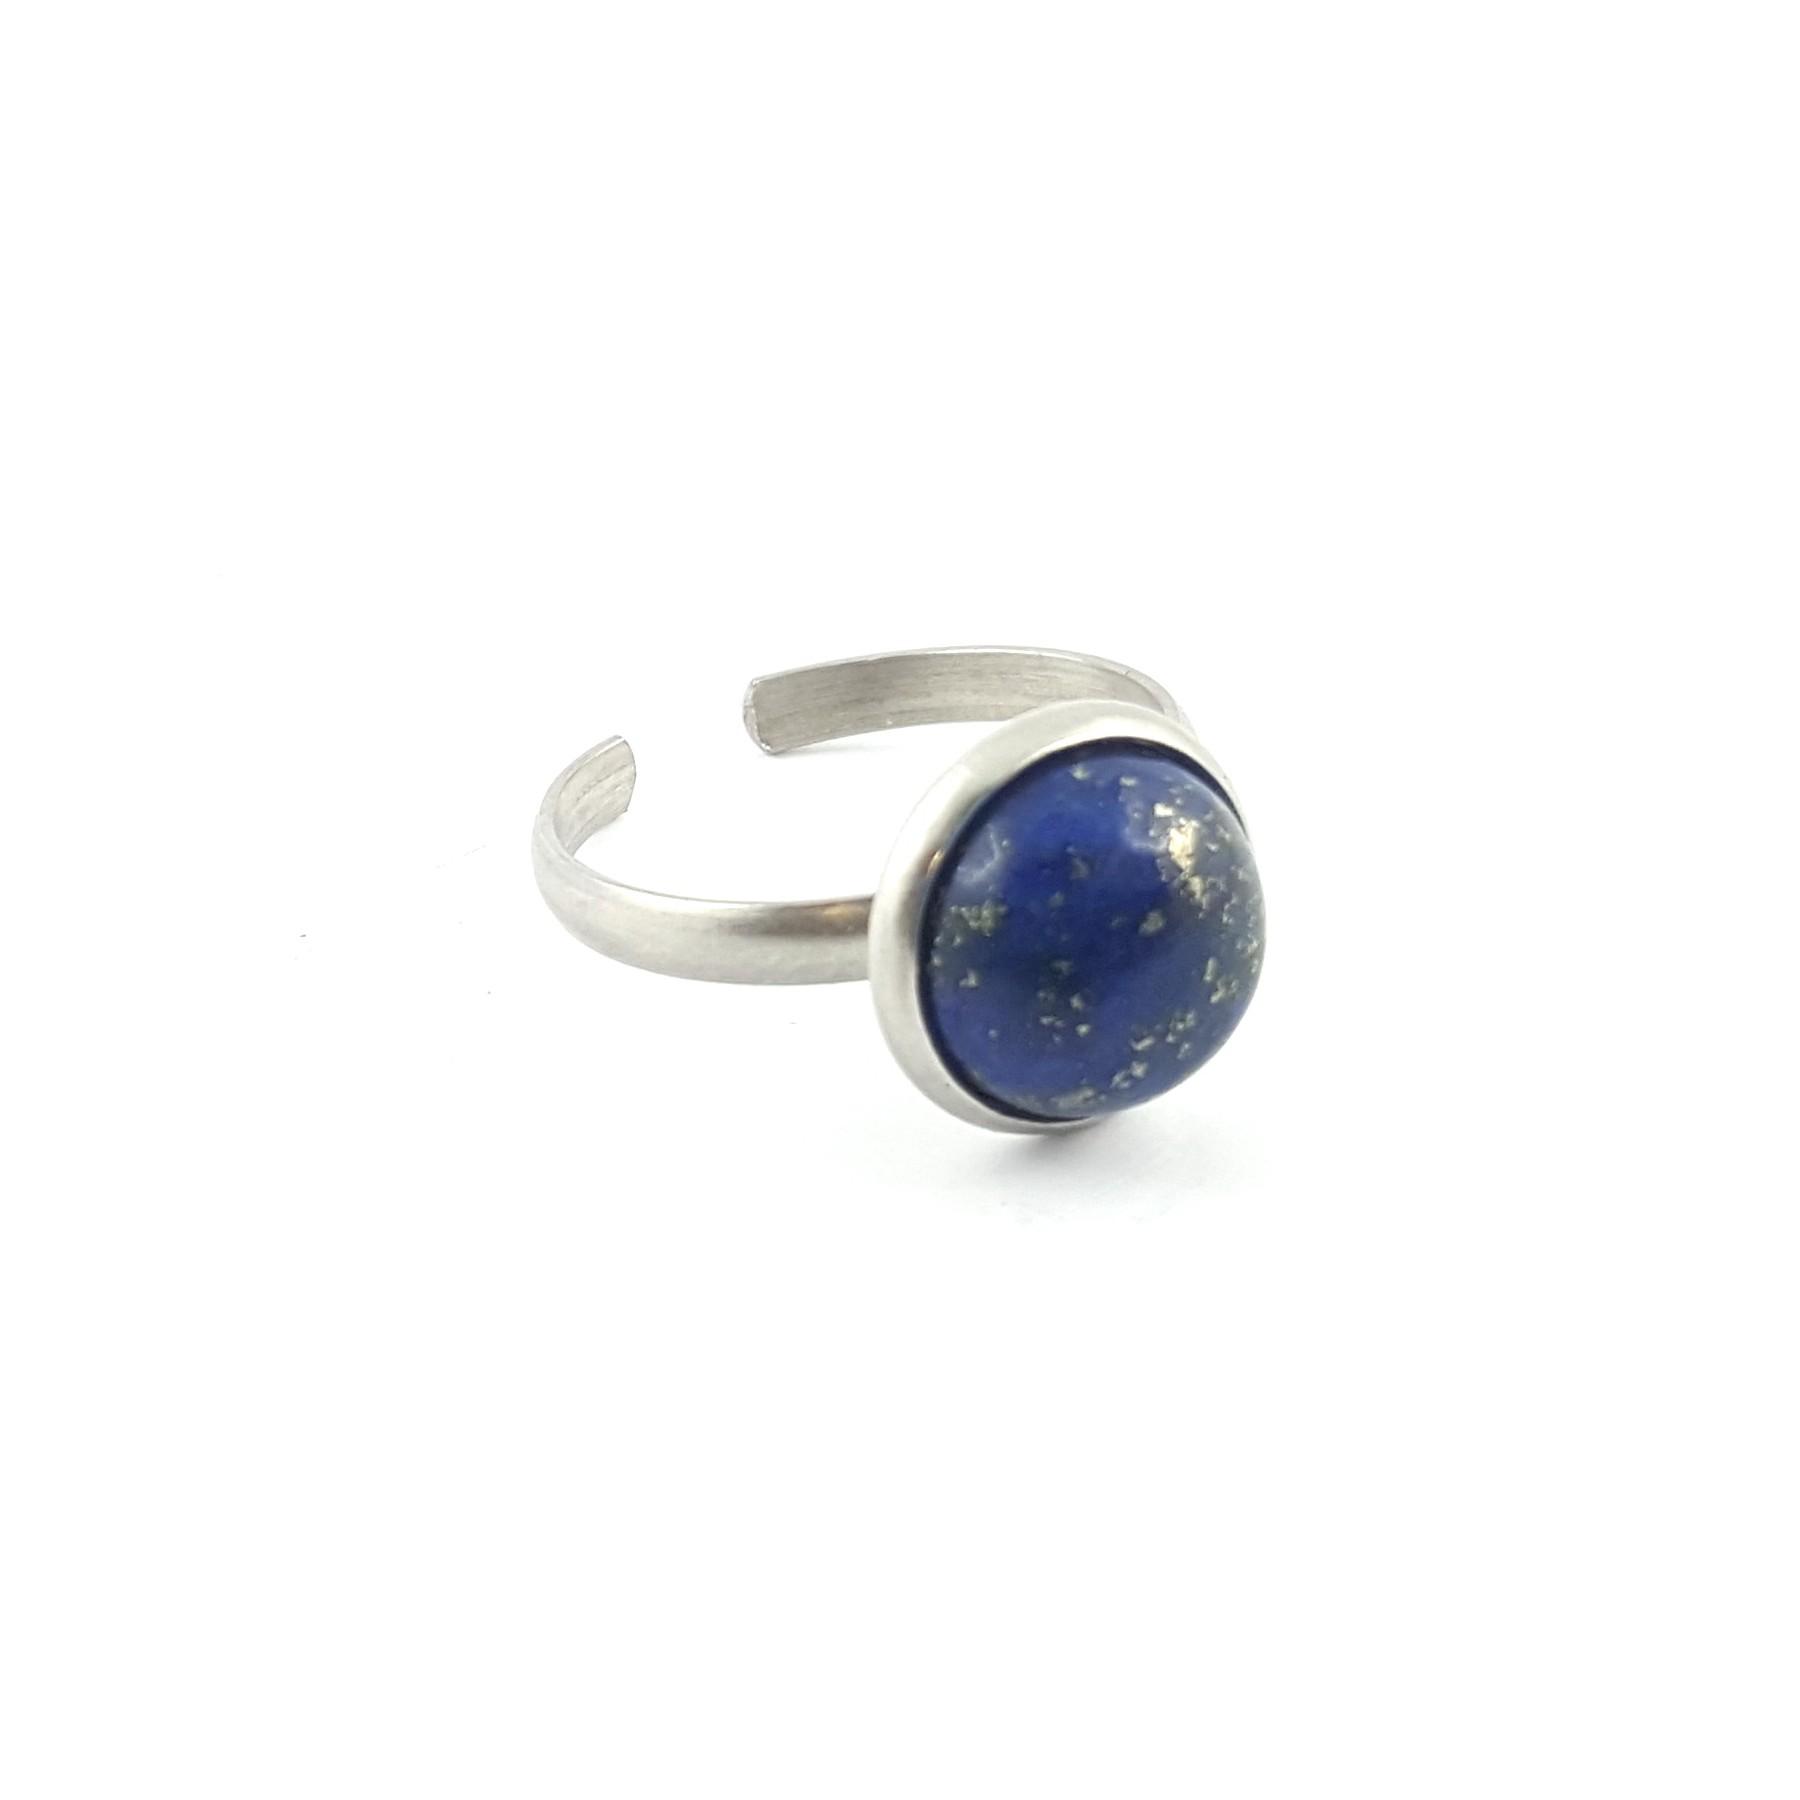 BAG mini inox lapis lazuli